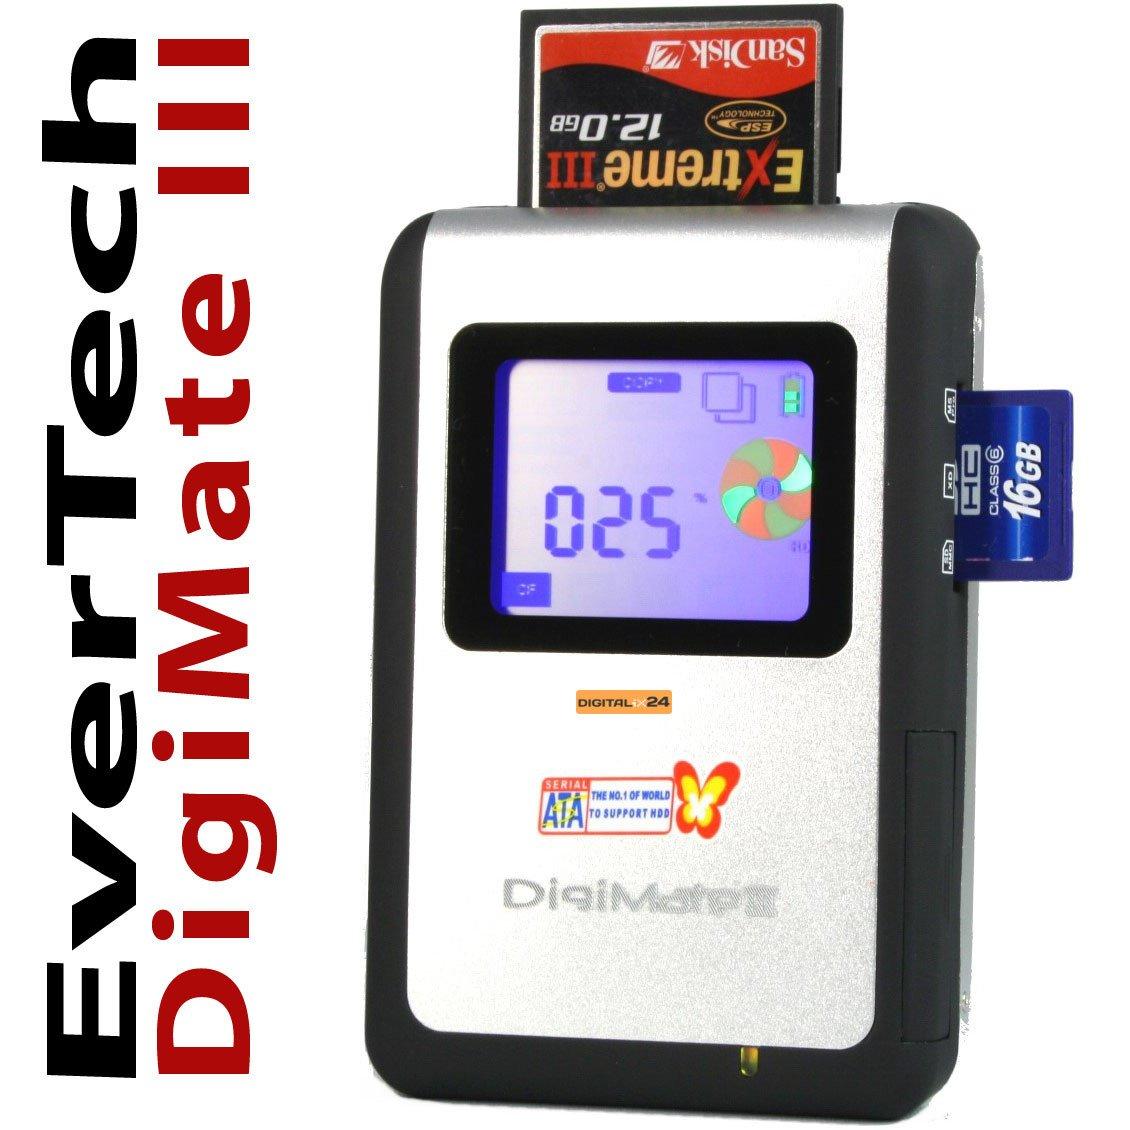 500 GB SSD EverTech DigiMate III SDHC SATA Portable Photo Bank, ImageTank,  Photo Backup Storage, mobile Data Storage Device and external Hard Drive  (USB ...